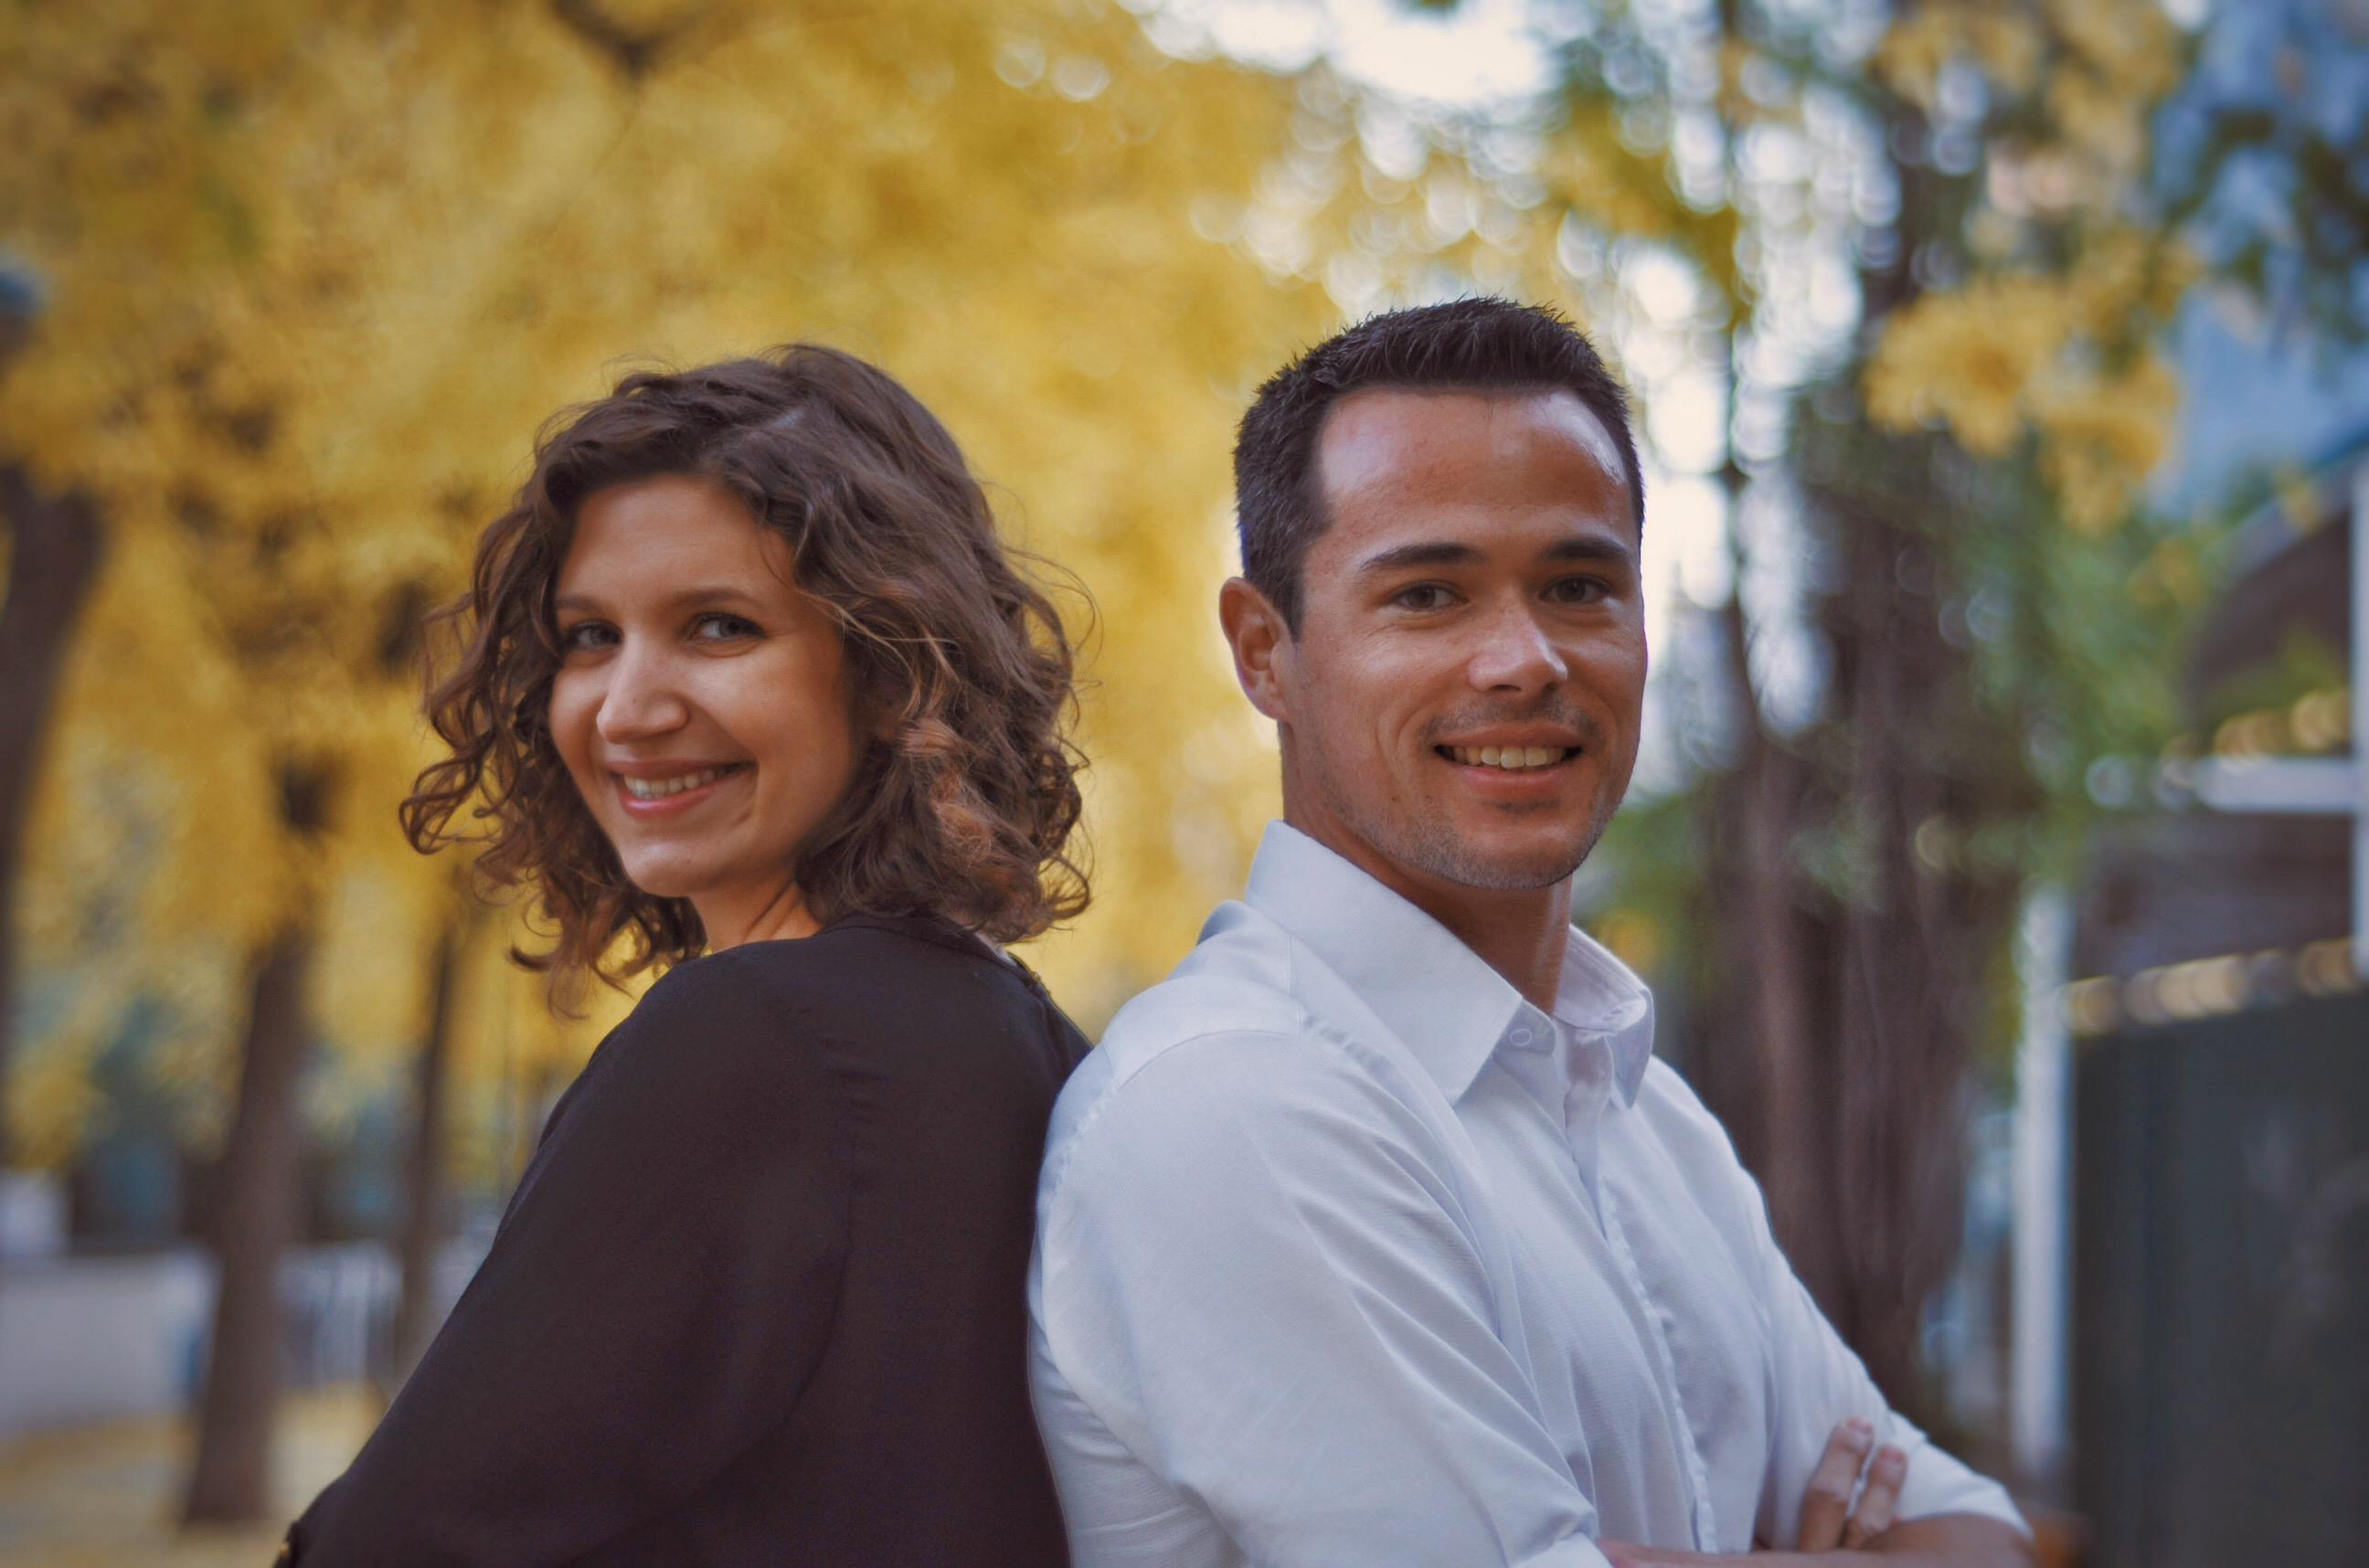 Wolfgang Fallmann und Miriam Boubachta, Foto: Markus Neubauer